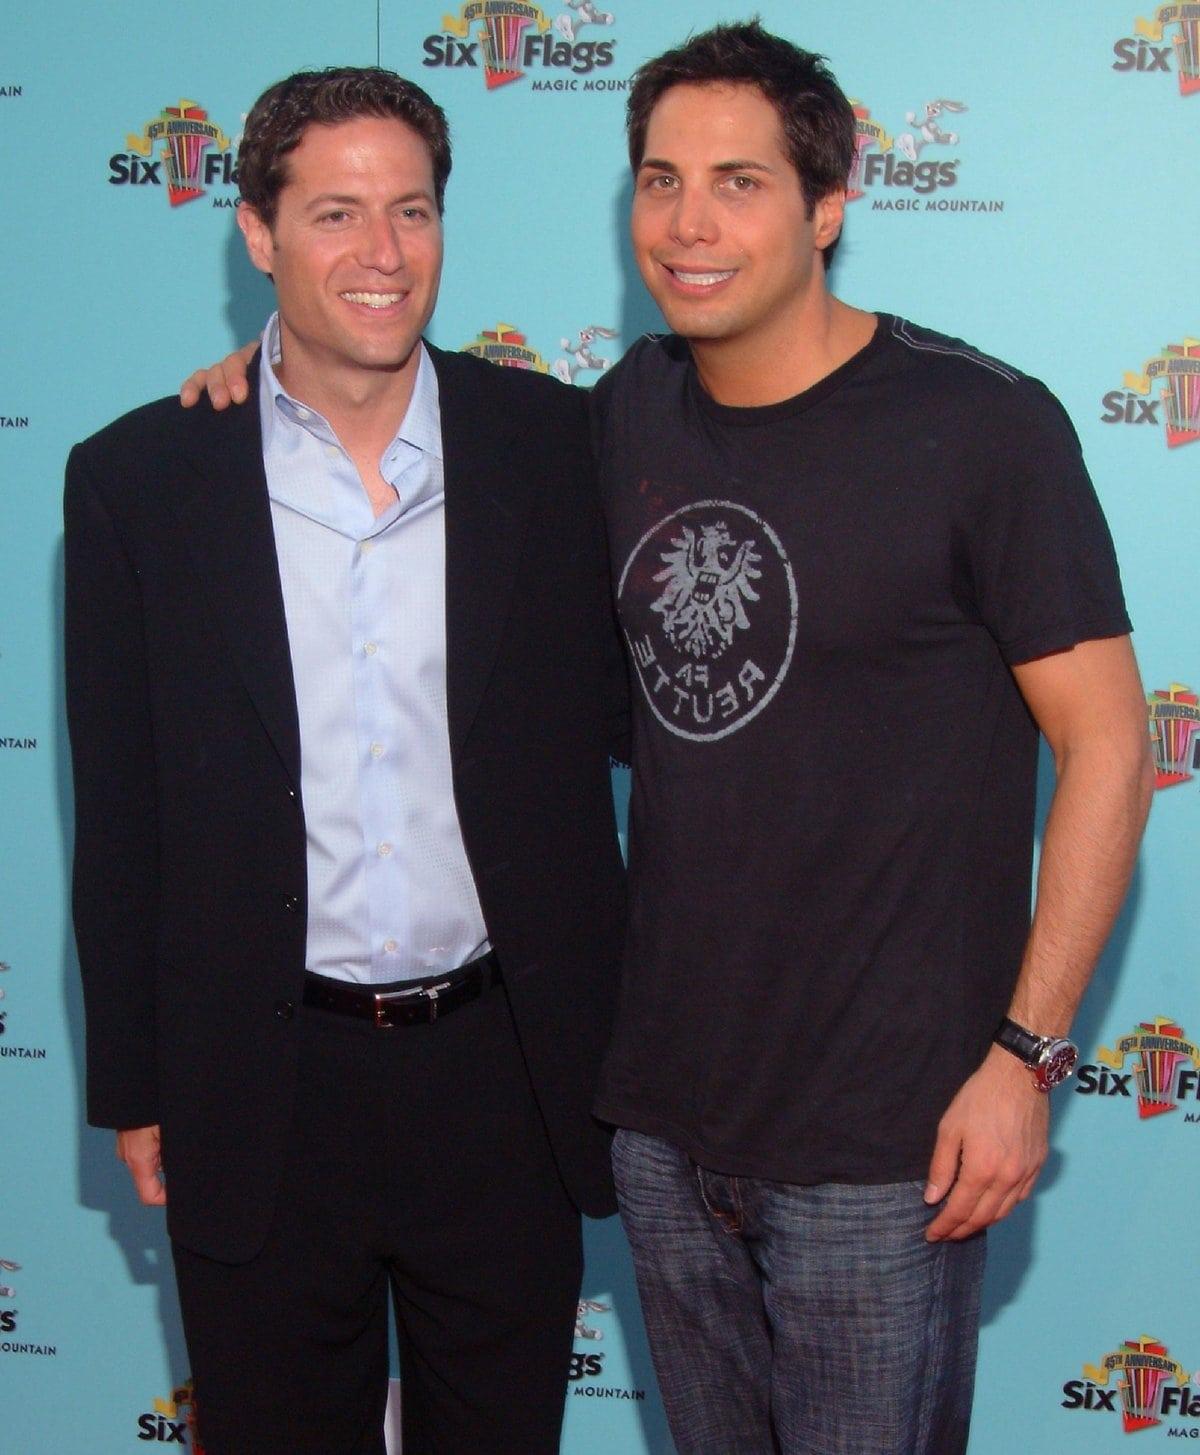 Mark Shapiro (L) arrives at Six Flags Magic Mountain to help Joe Francis celebrate his birthday